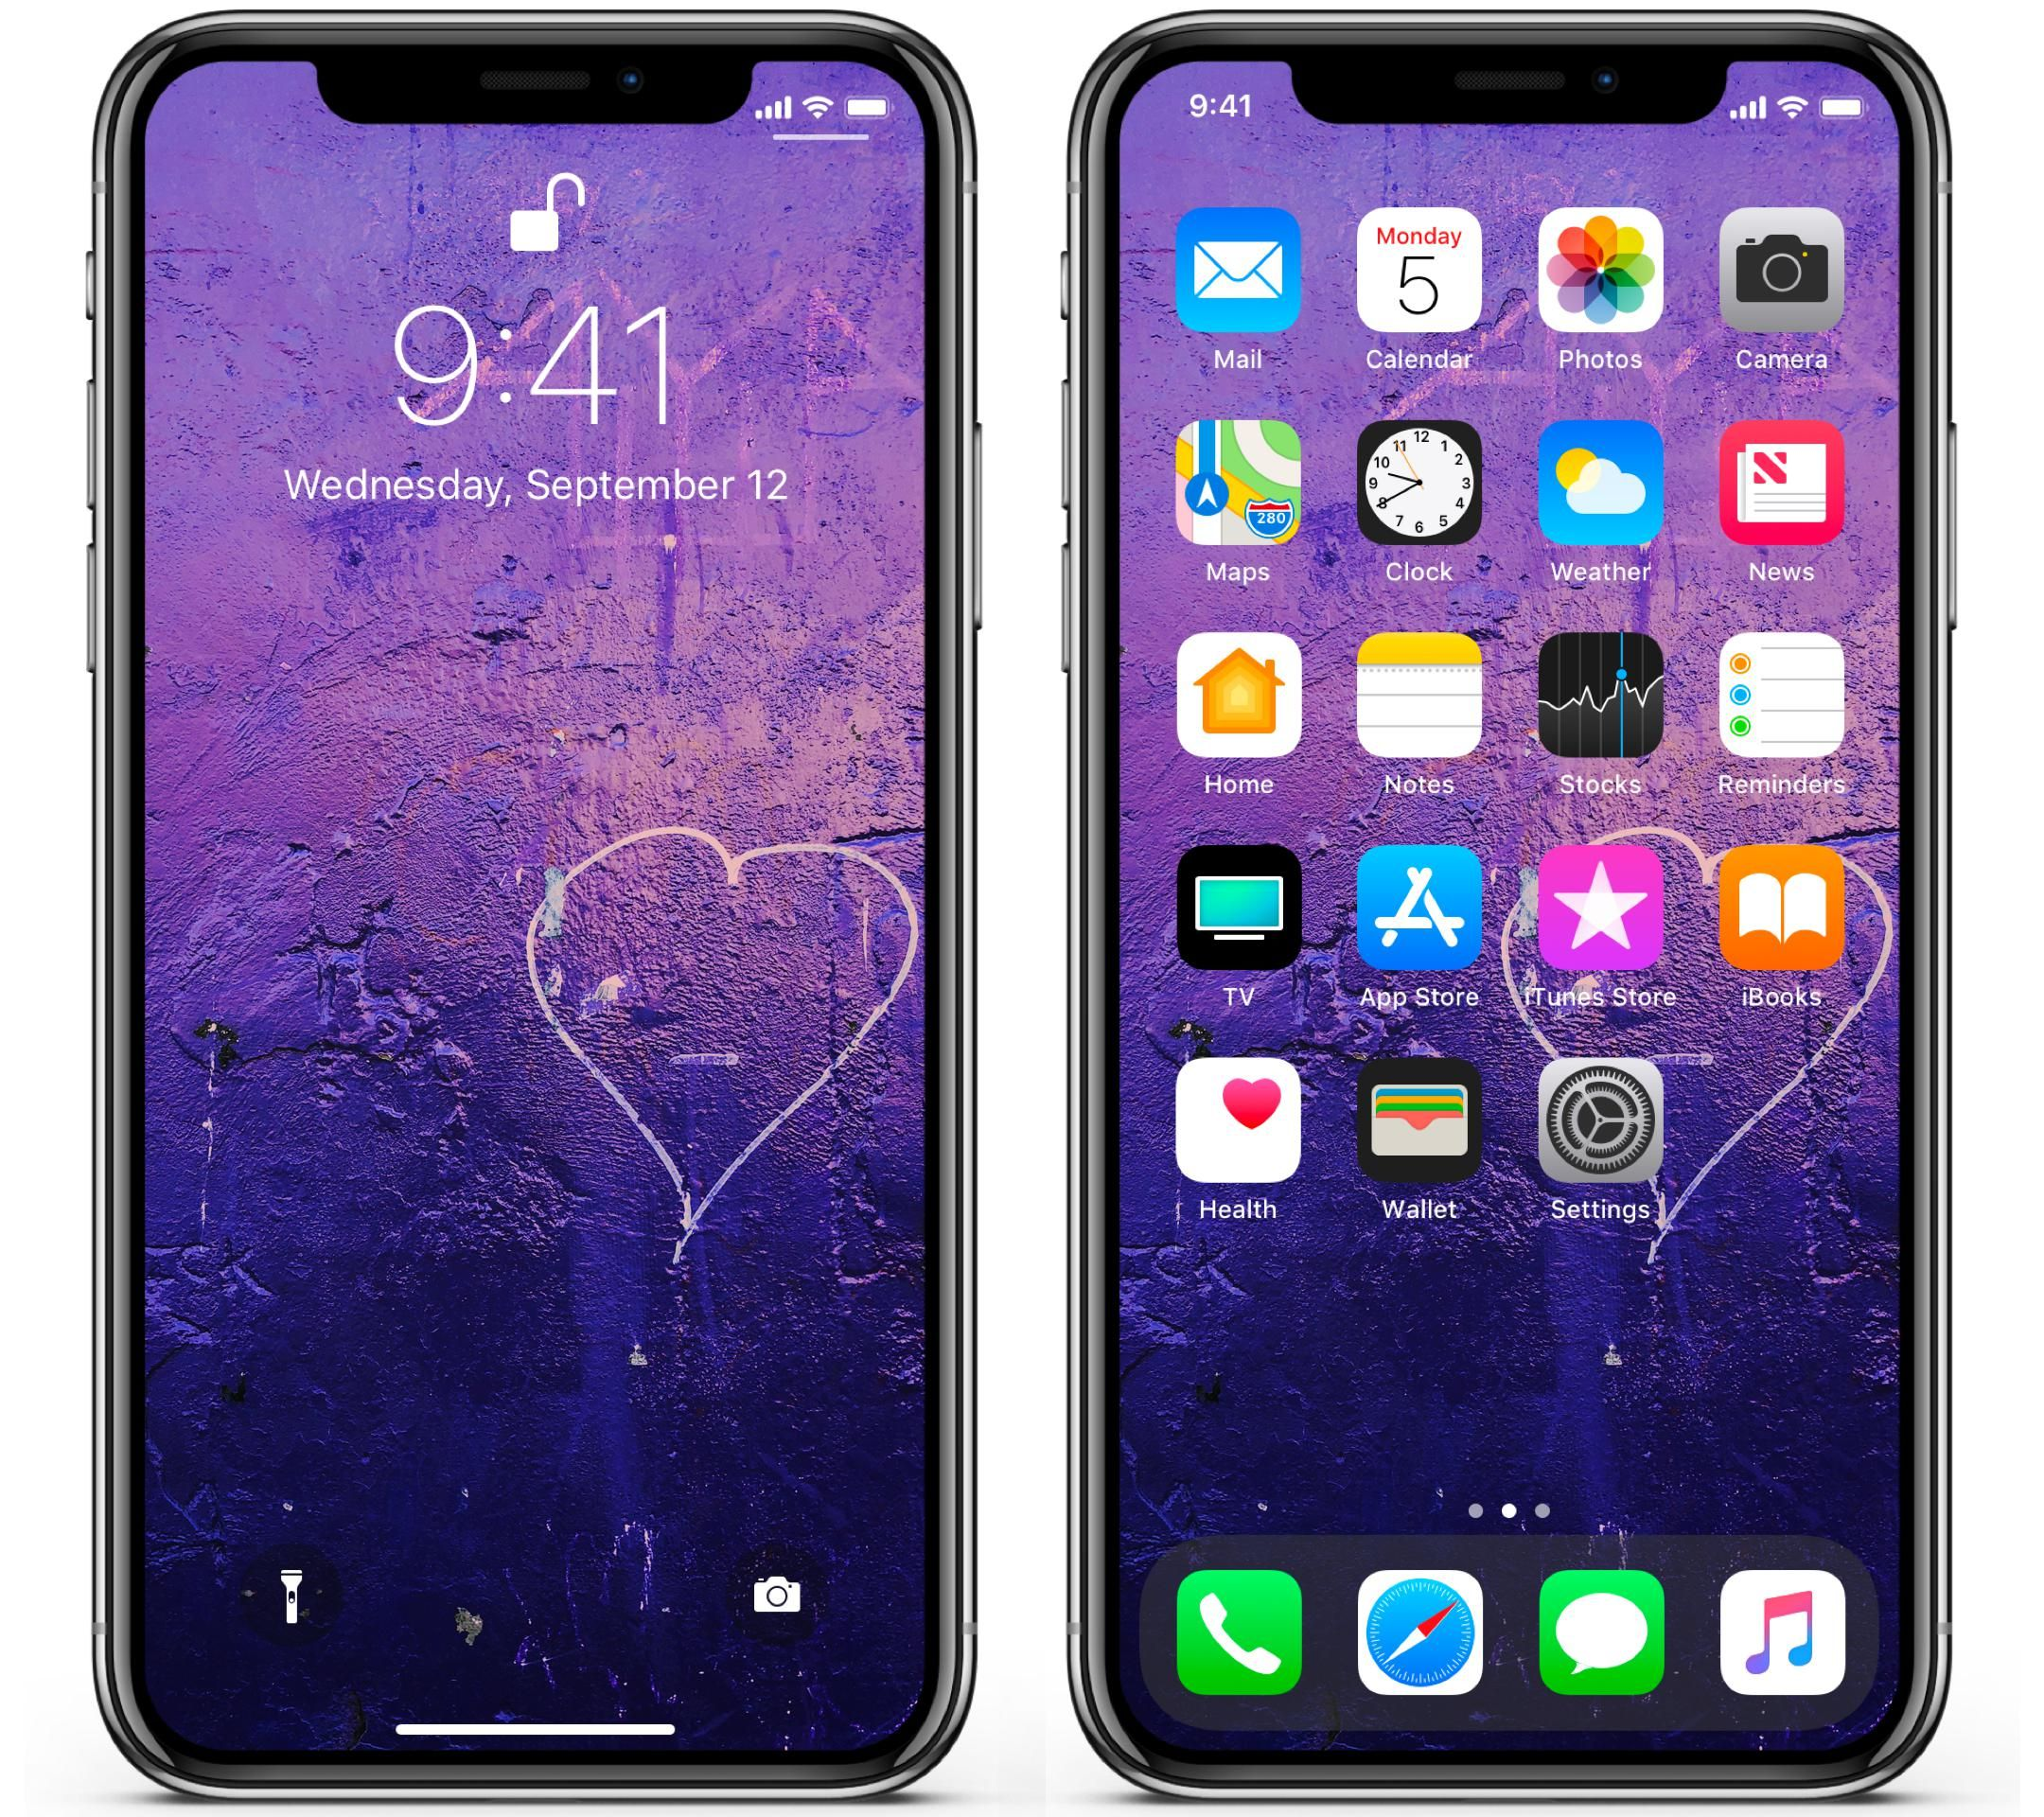 Wallpaper Day Wall Art Heart Purple For Hd 4k Wallpaperday For Desktop Mobile Phones Free Download In 2020 Wallpaper Mobile Phone Day